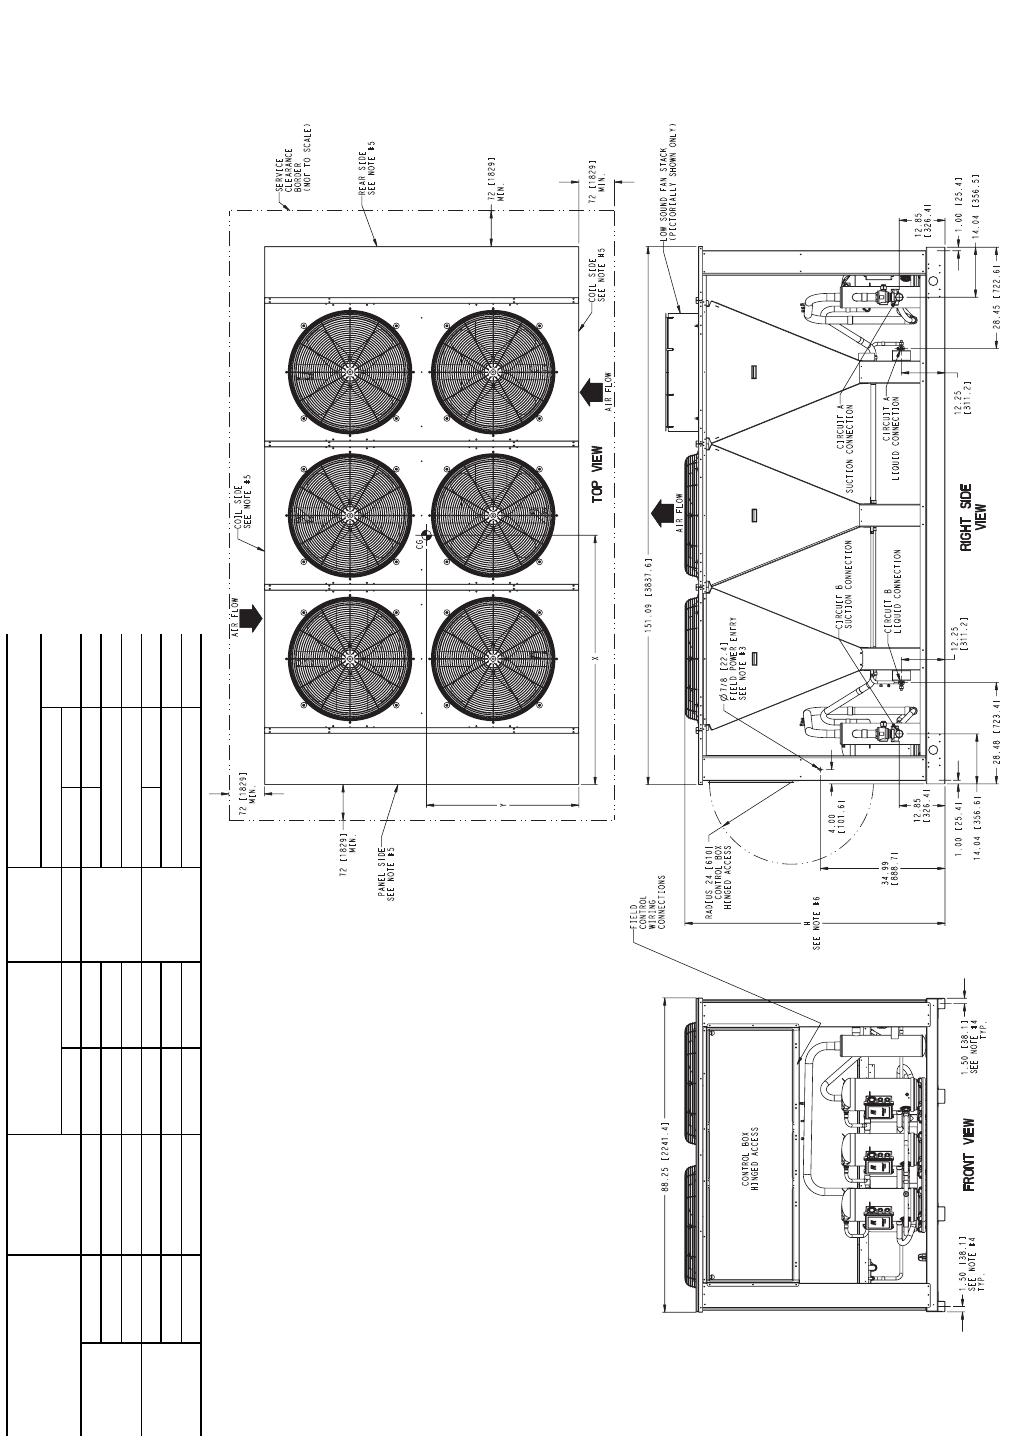 Carrier 38apd025 100 38aps025 050 A38 Fig 8 38ap